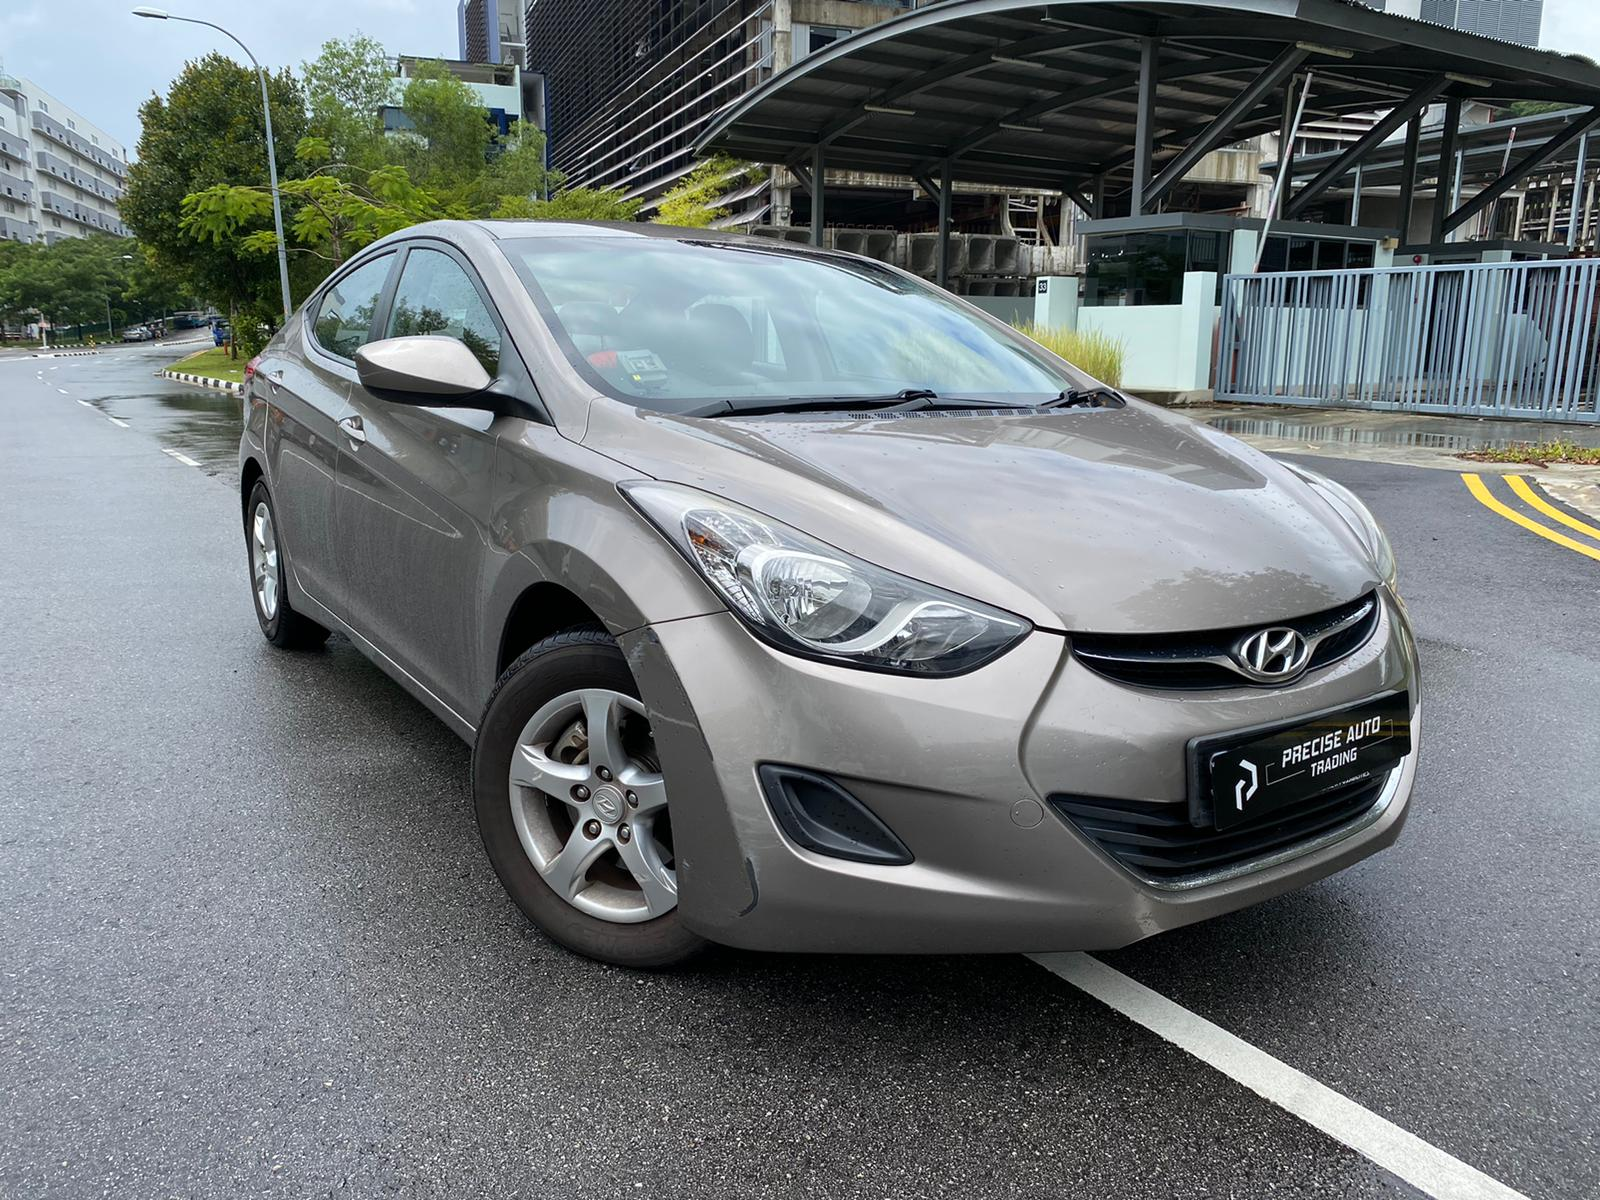 Hyundai Elantra 1.6A (PHV Private Hire Rental)